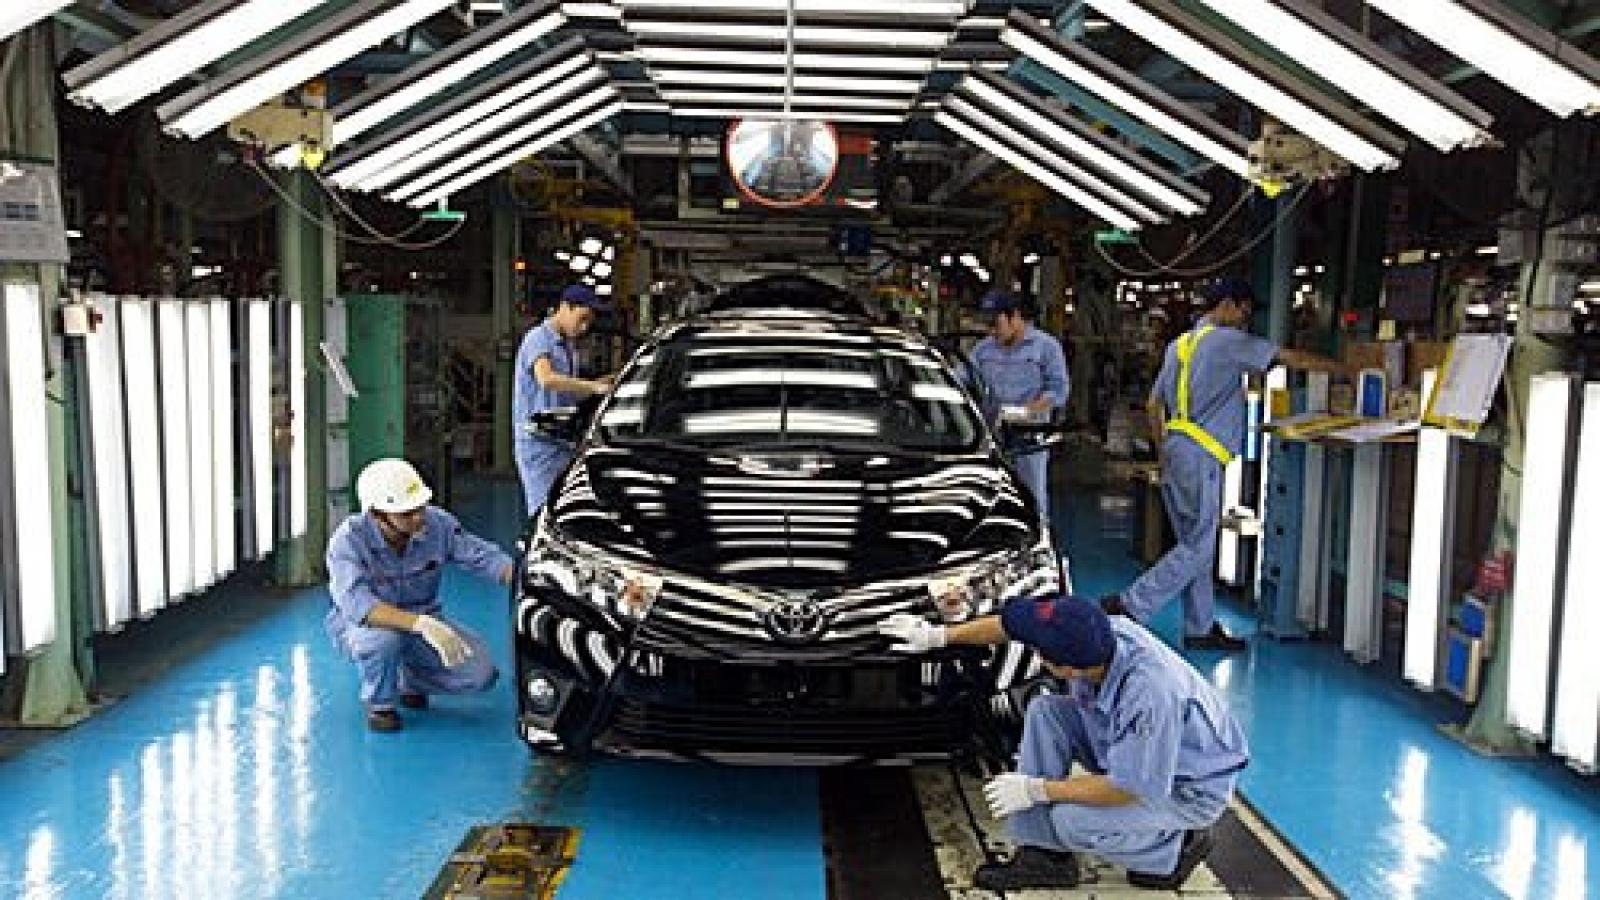 Vinh Phuc province lures US$3.43 billion in FDI